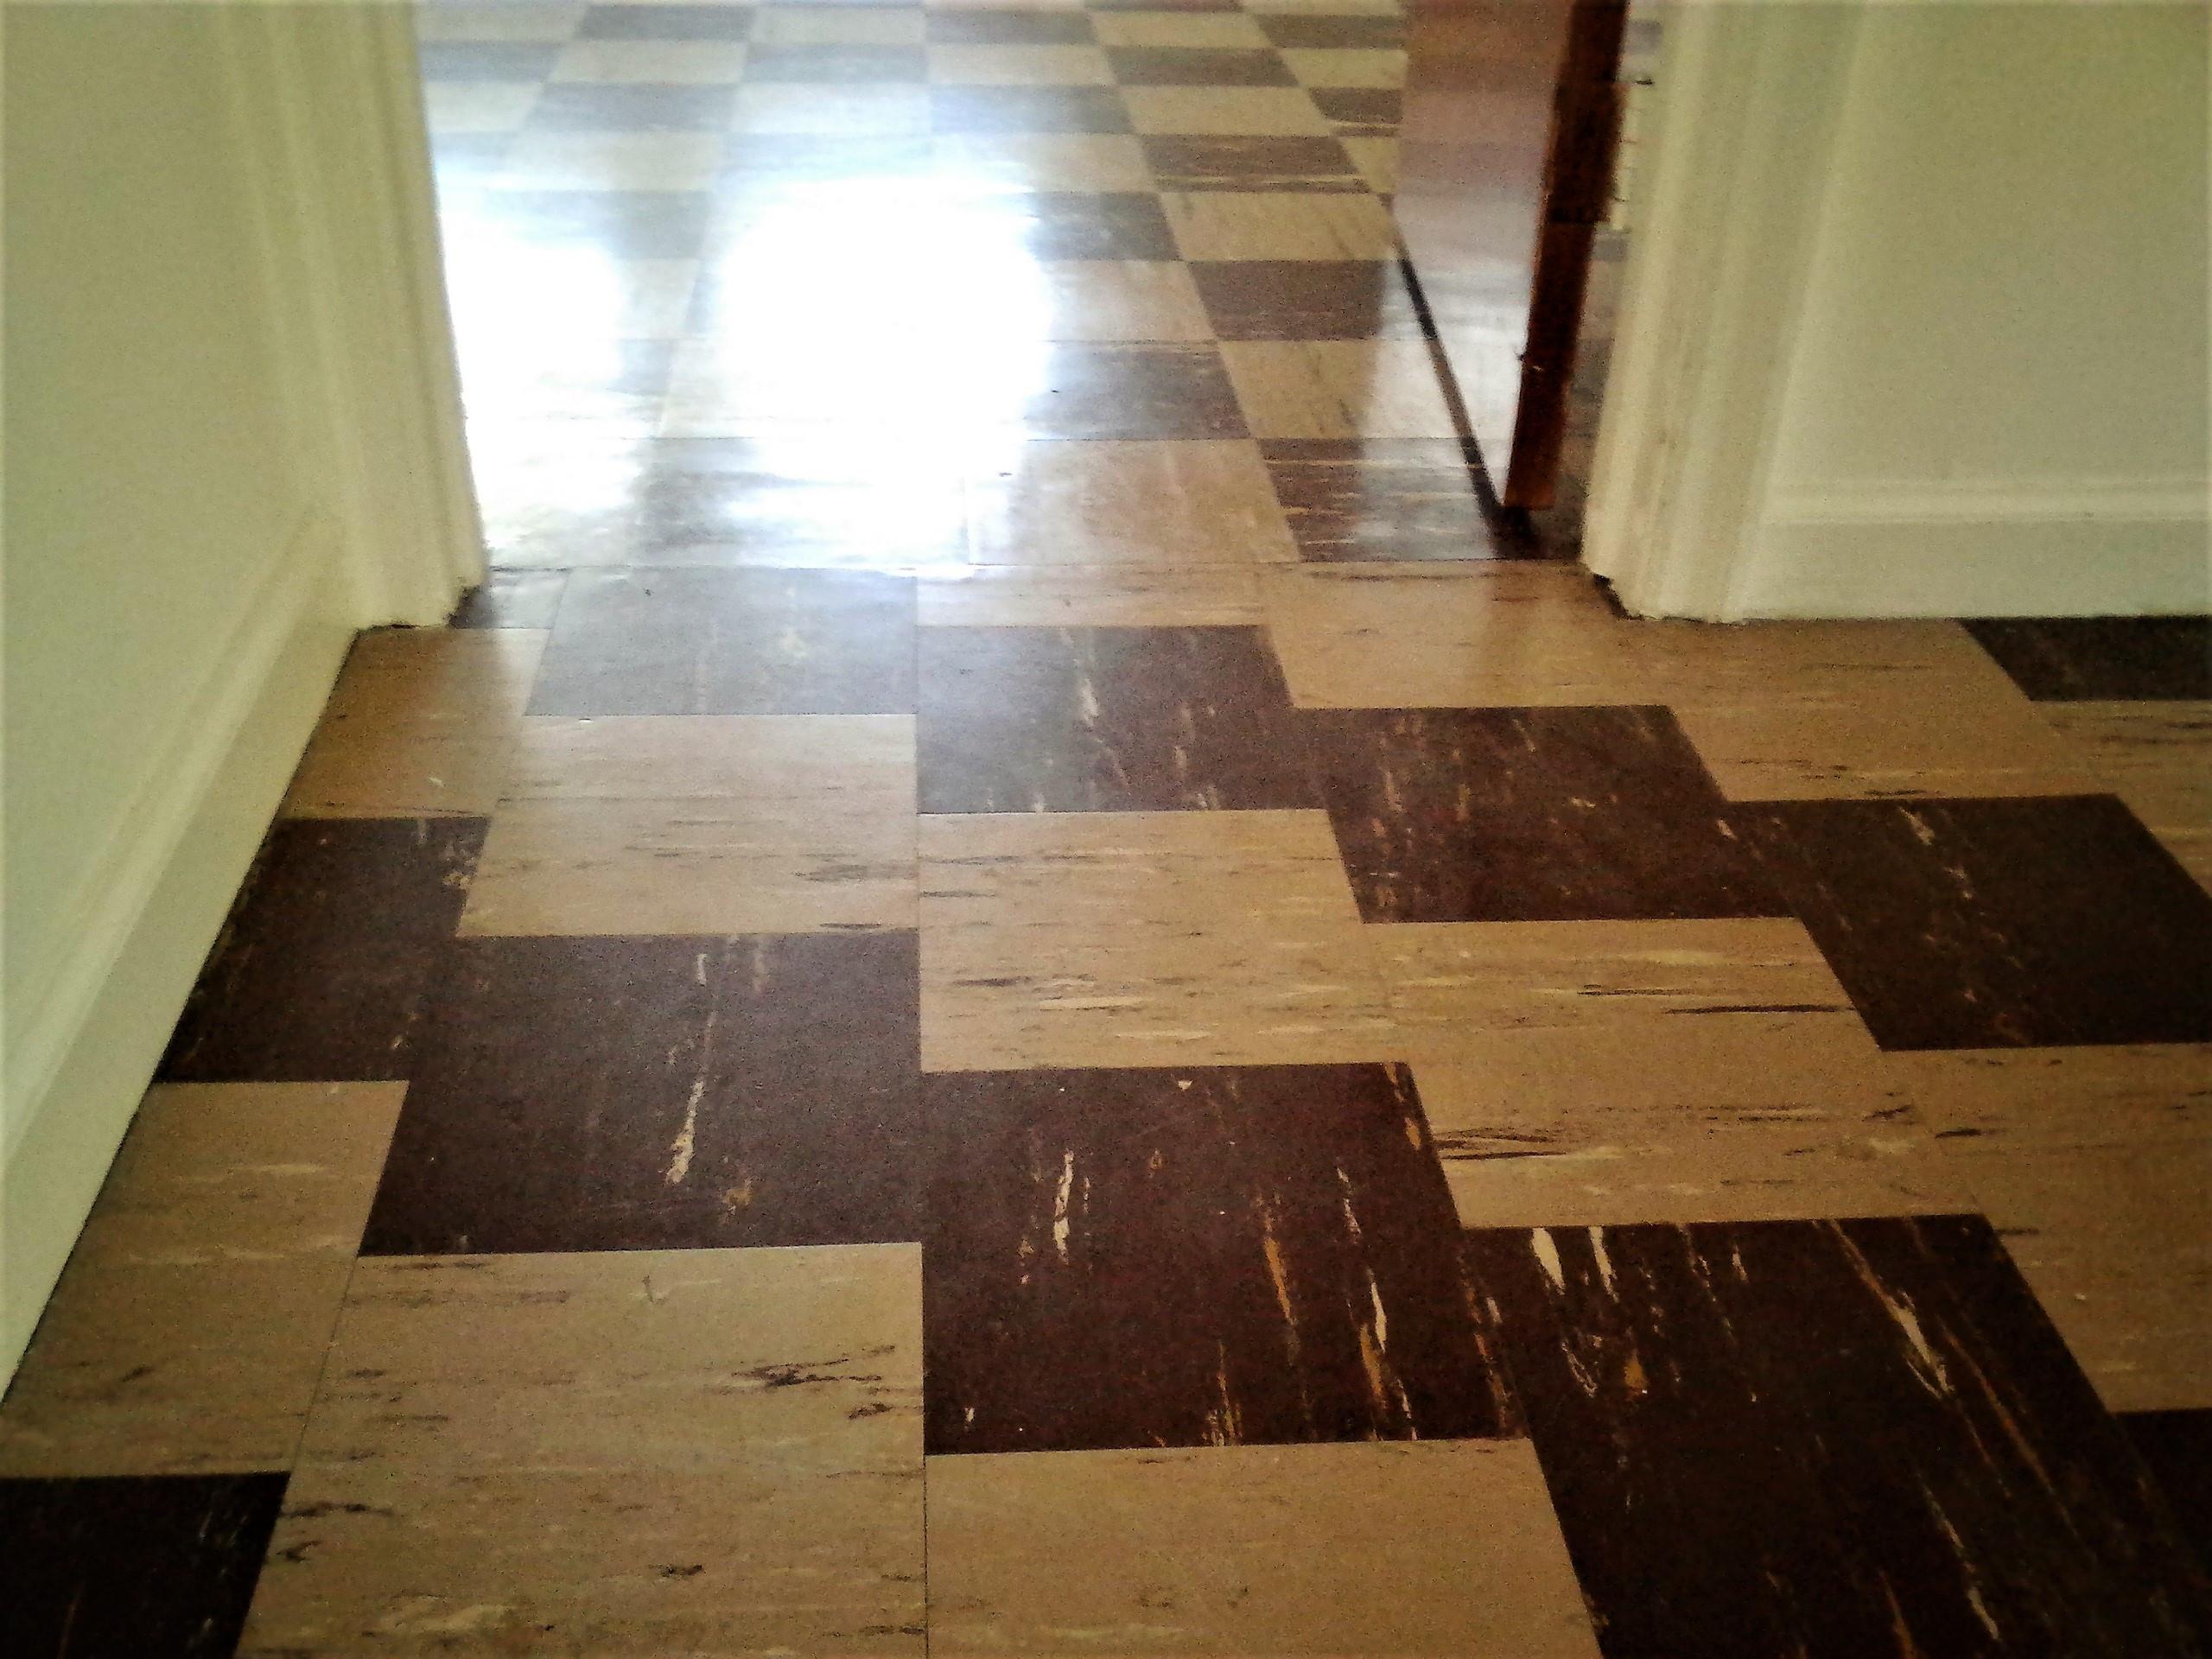 18 Popular Hardwood Flooring and Installation Cost 2021 free download hardwood flooring and installation cost of asbestos flooring do you really need that abatement the flooring blog regarding old vinyl asbestos tile flooring